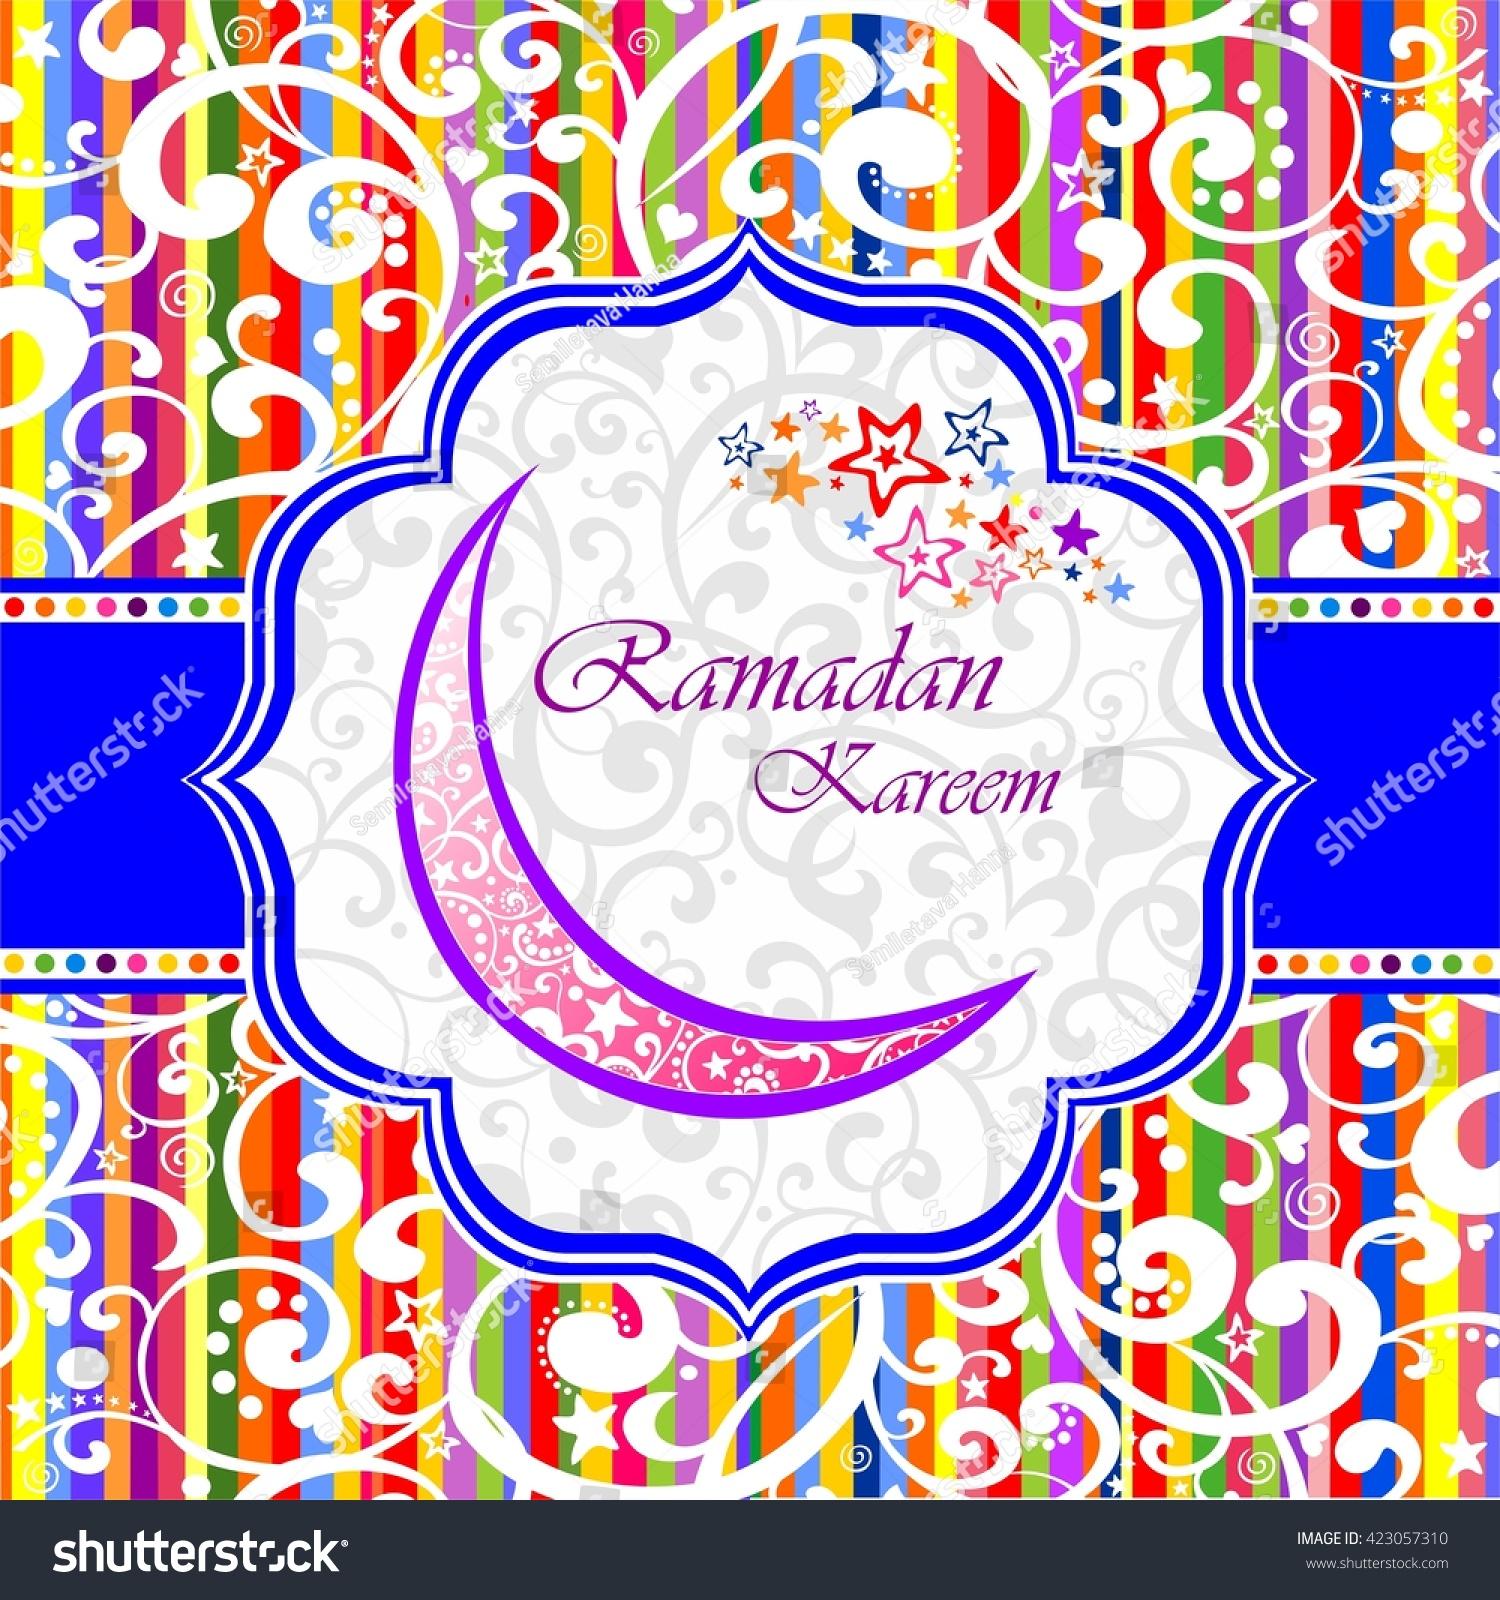 Ramadan greetings arabic script islamic greeting stock illustration ramadan greetings in arabic script an islamic greeting card for holy month of ramadan kareem kristyandbryce Image collections